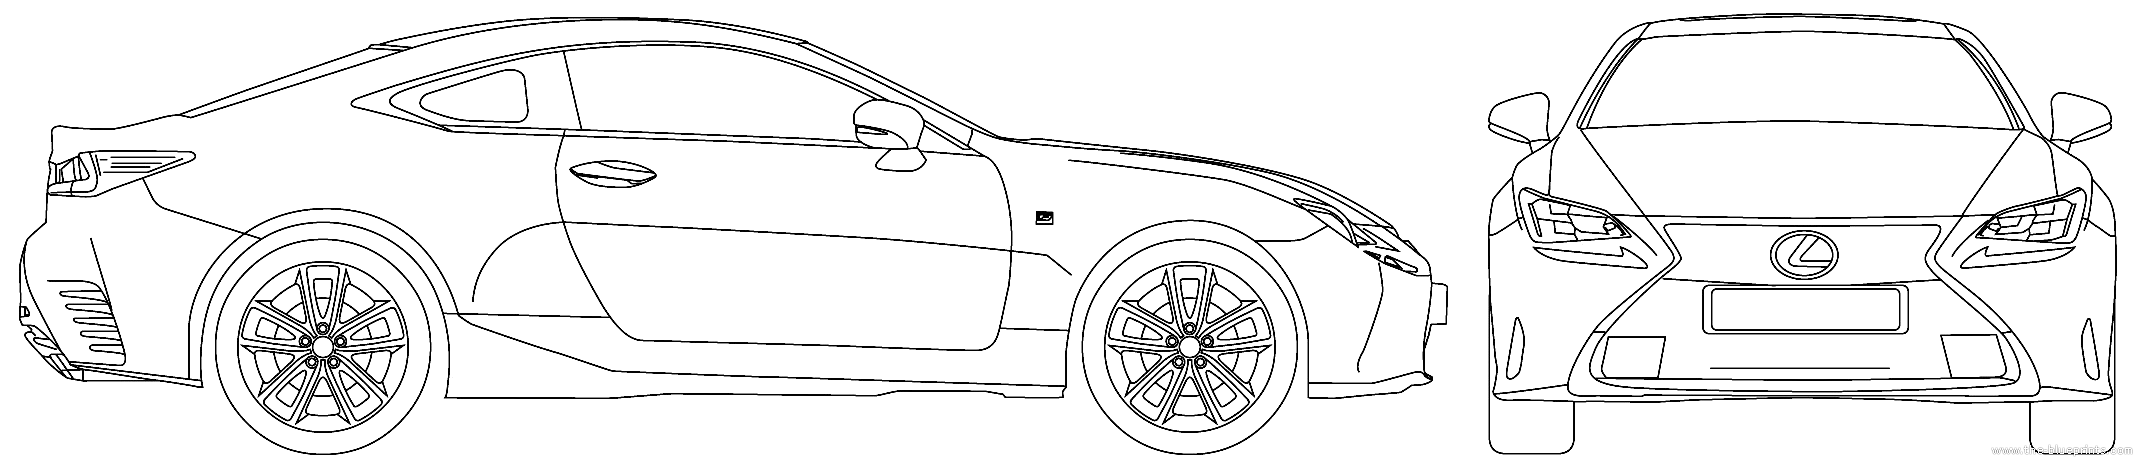 Blueprints cars lexus lexus rc 300 300h f sport 2016 lexus rc 300 300h f sport 2016 malvernweather Image collections